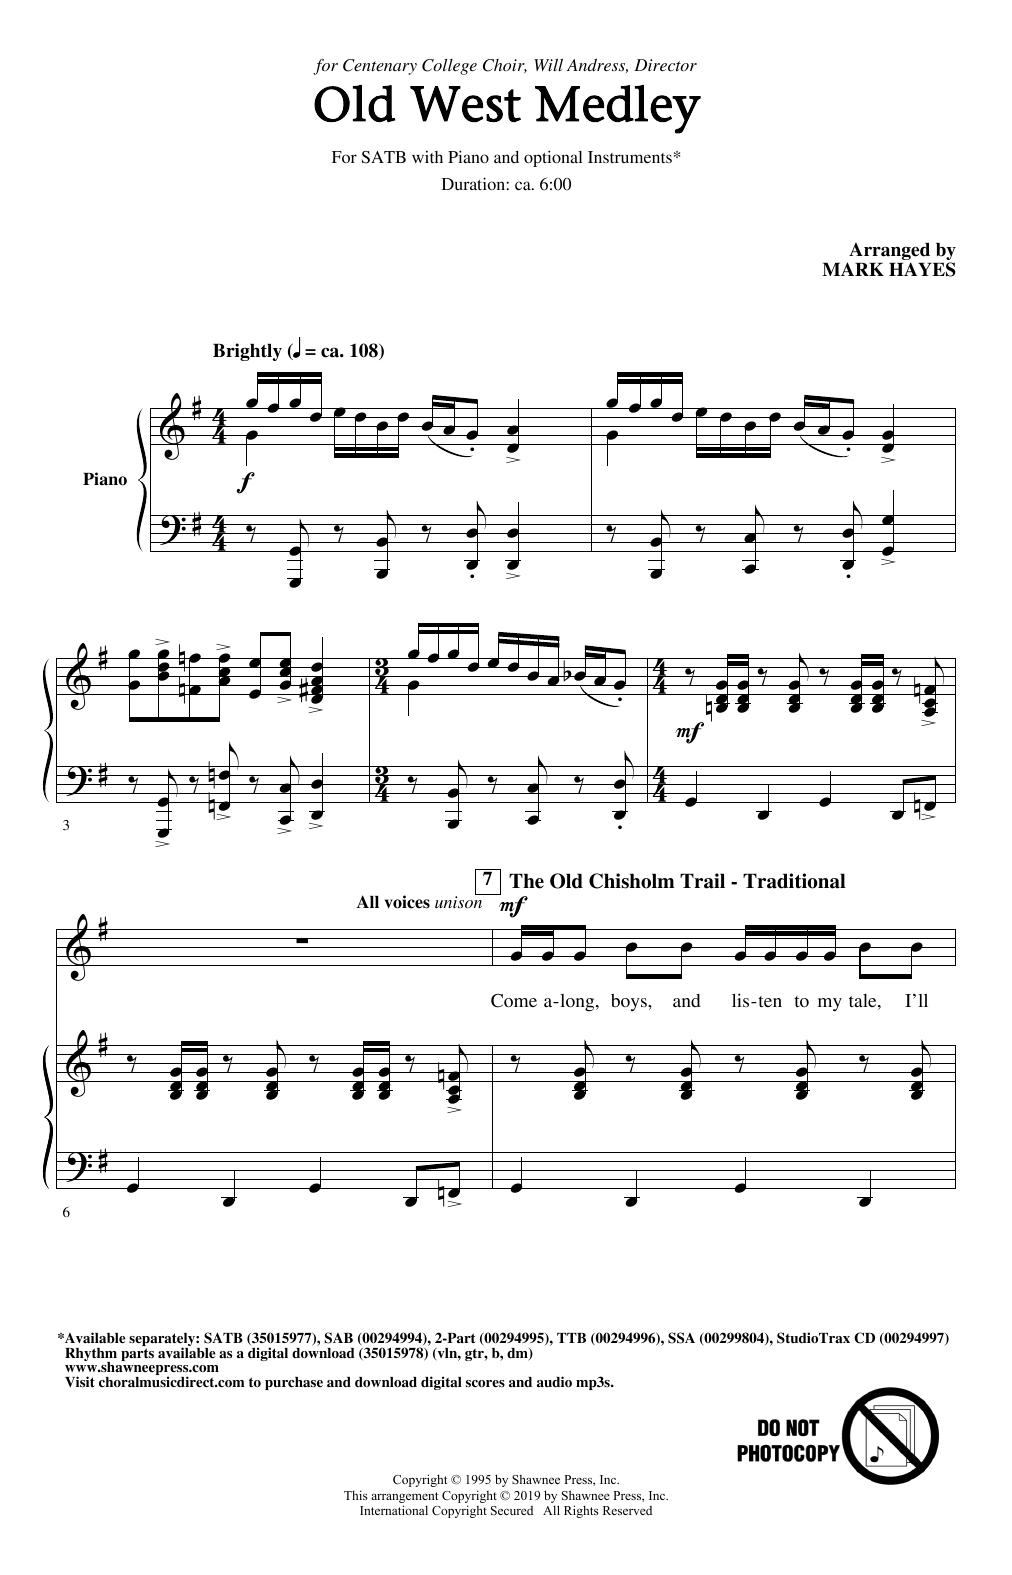 Old West Medley (arr. Mark Hayes) (SATB Choir)